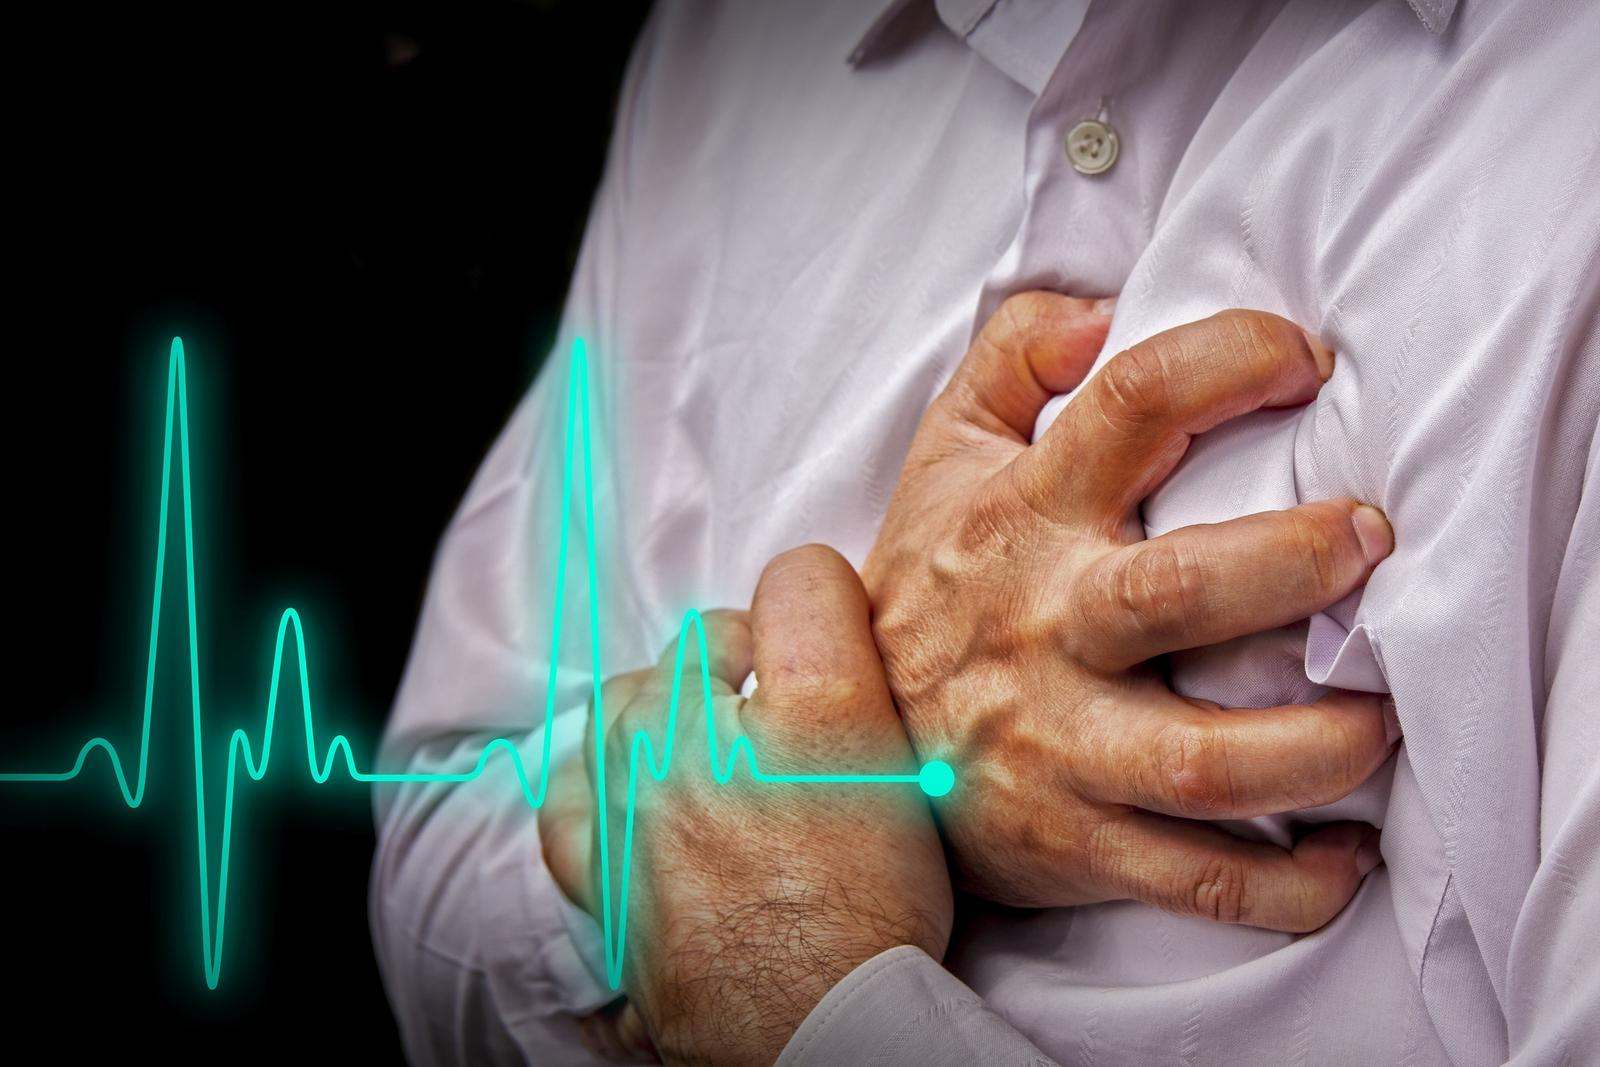 hipertenzija žiūrėti internete 2020 m